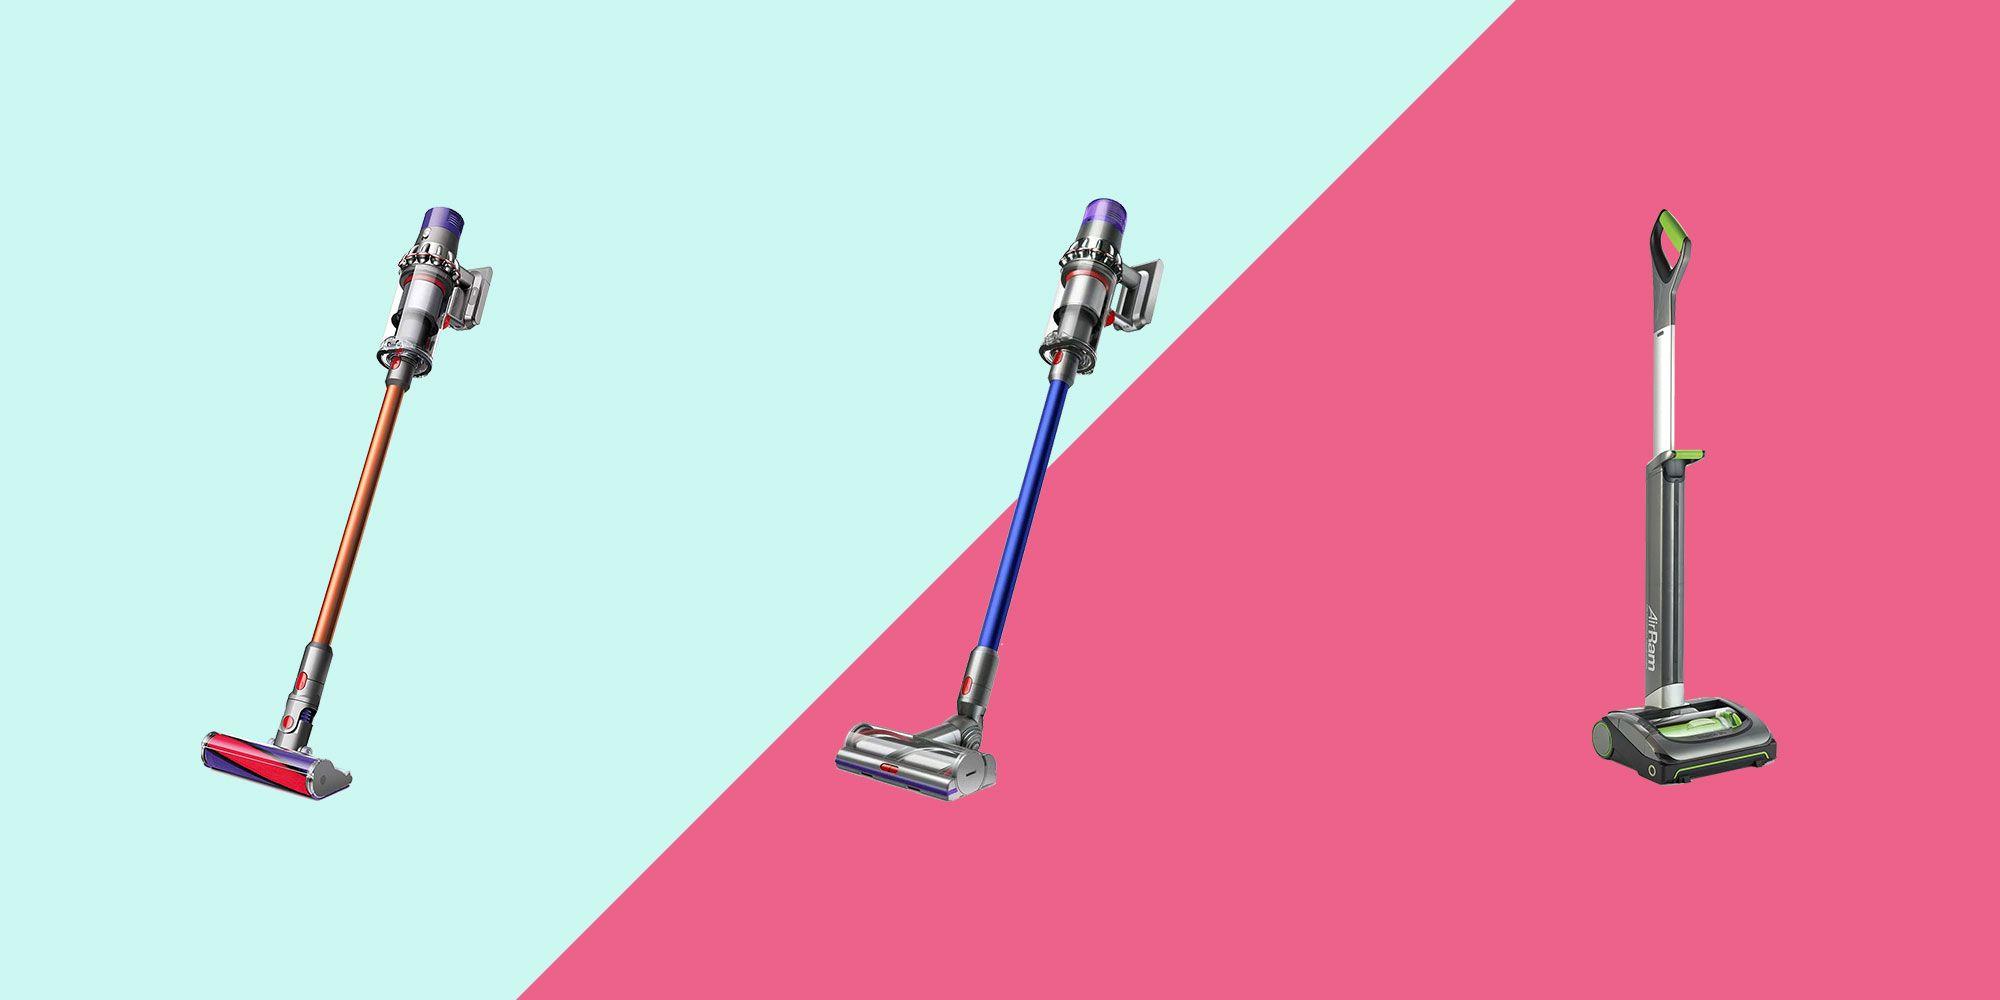 The Beldray Revo handheld vacuum is